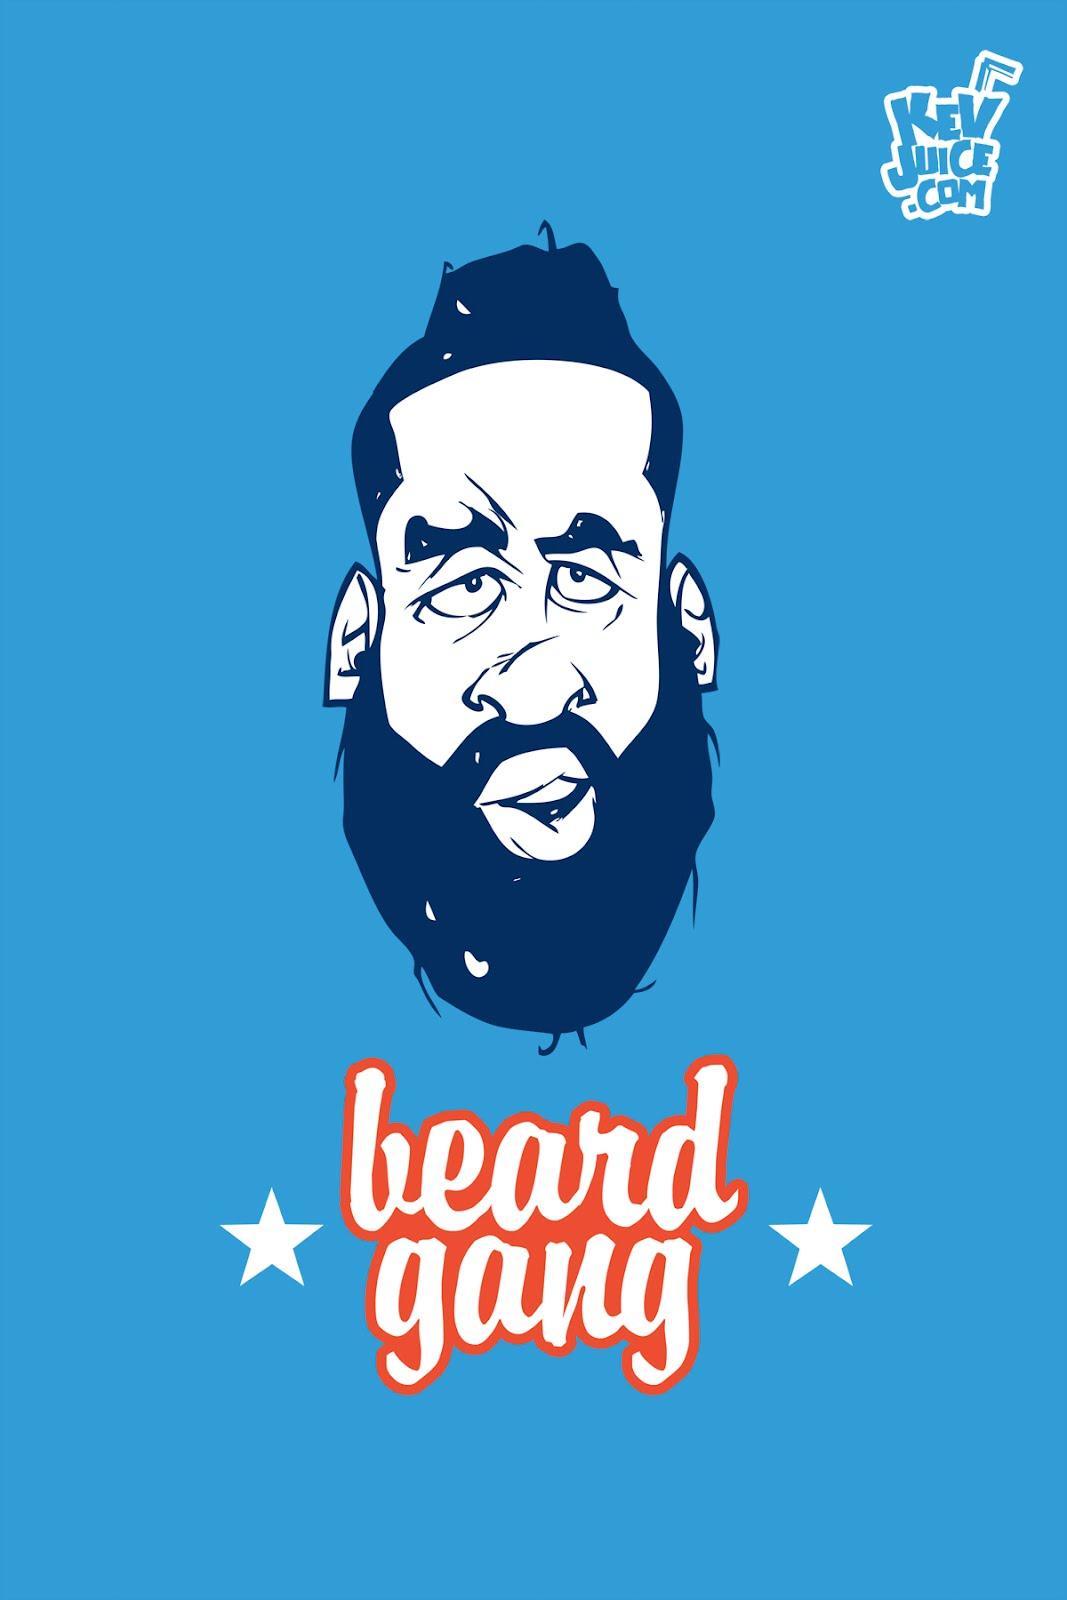 James harden fear the beard logo - photo#40